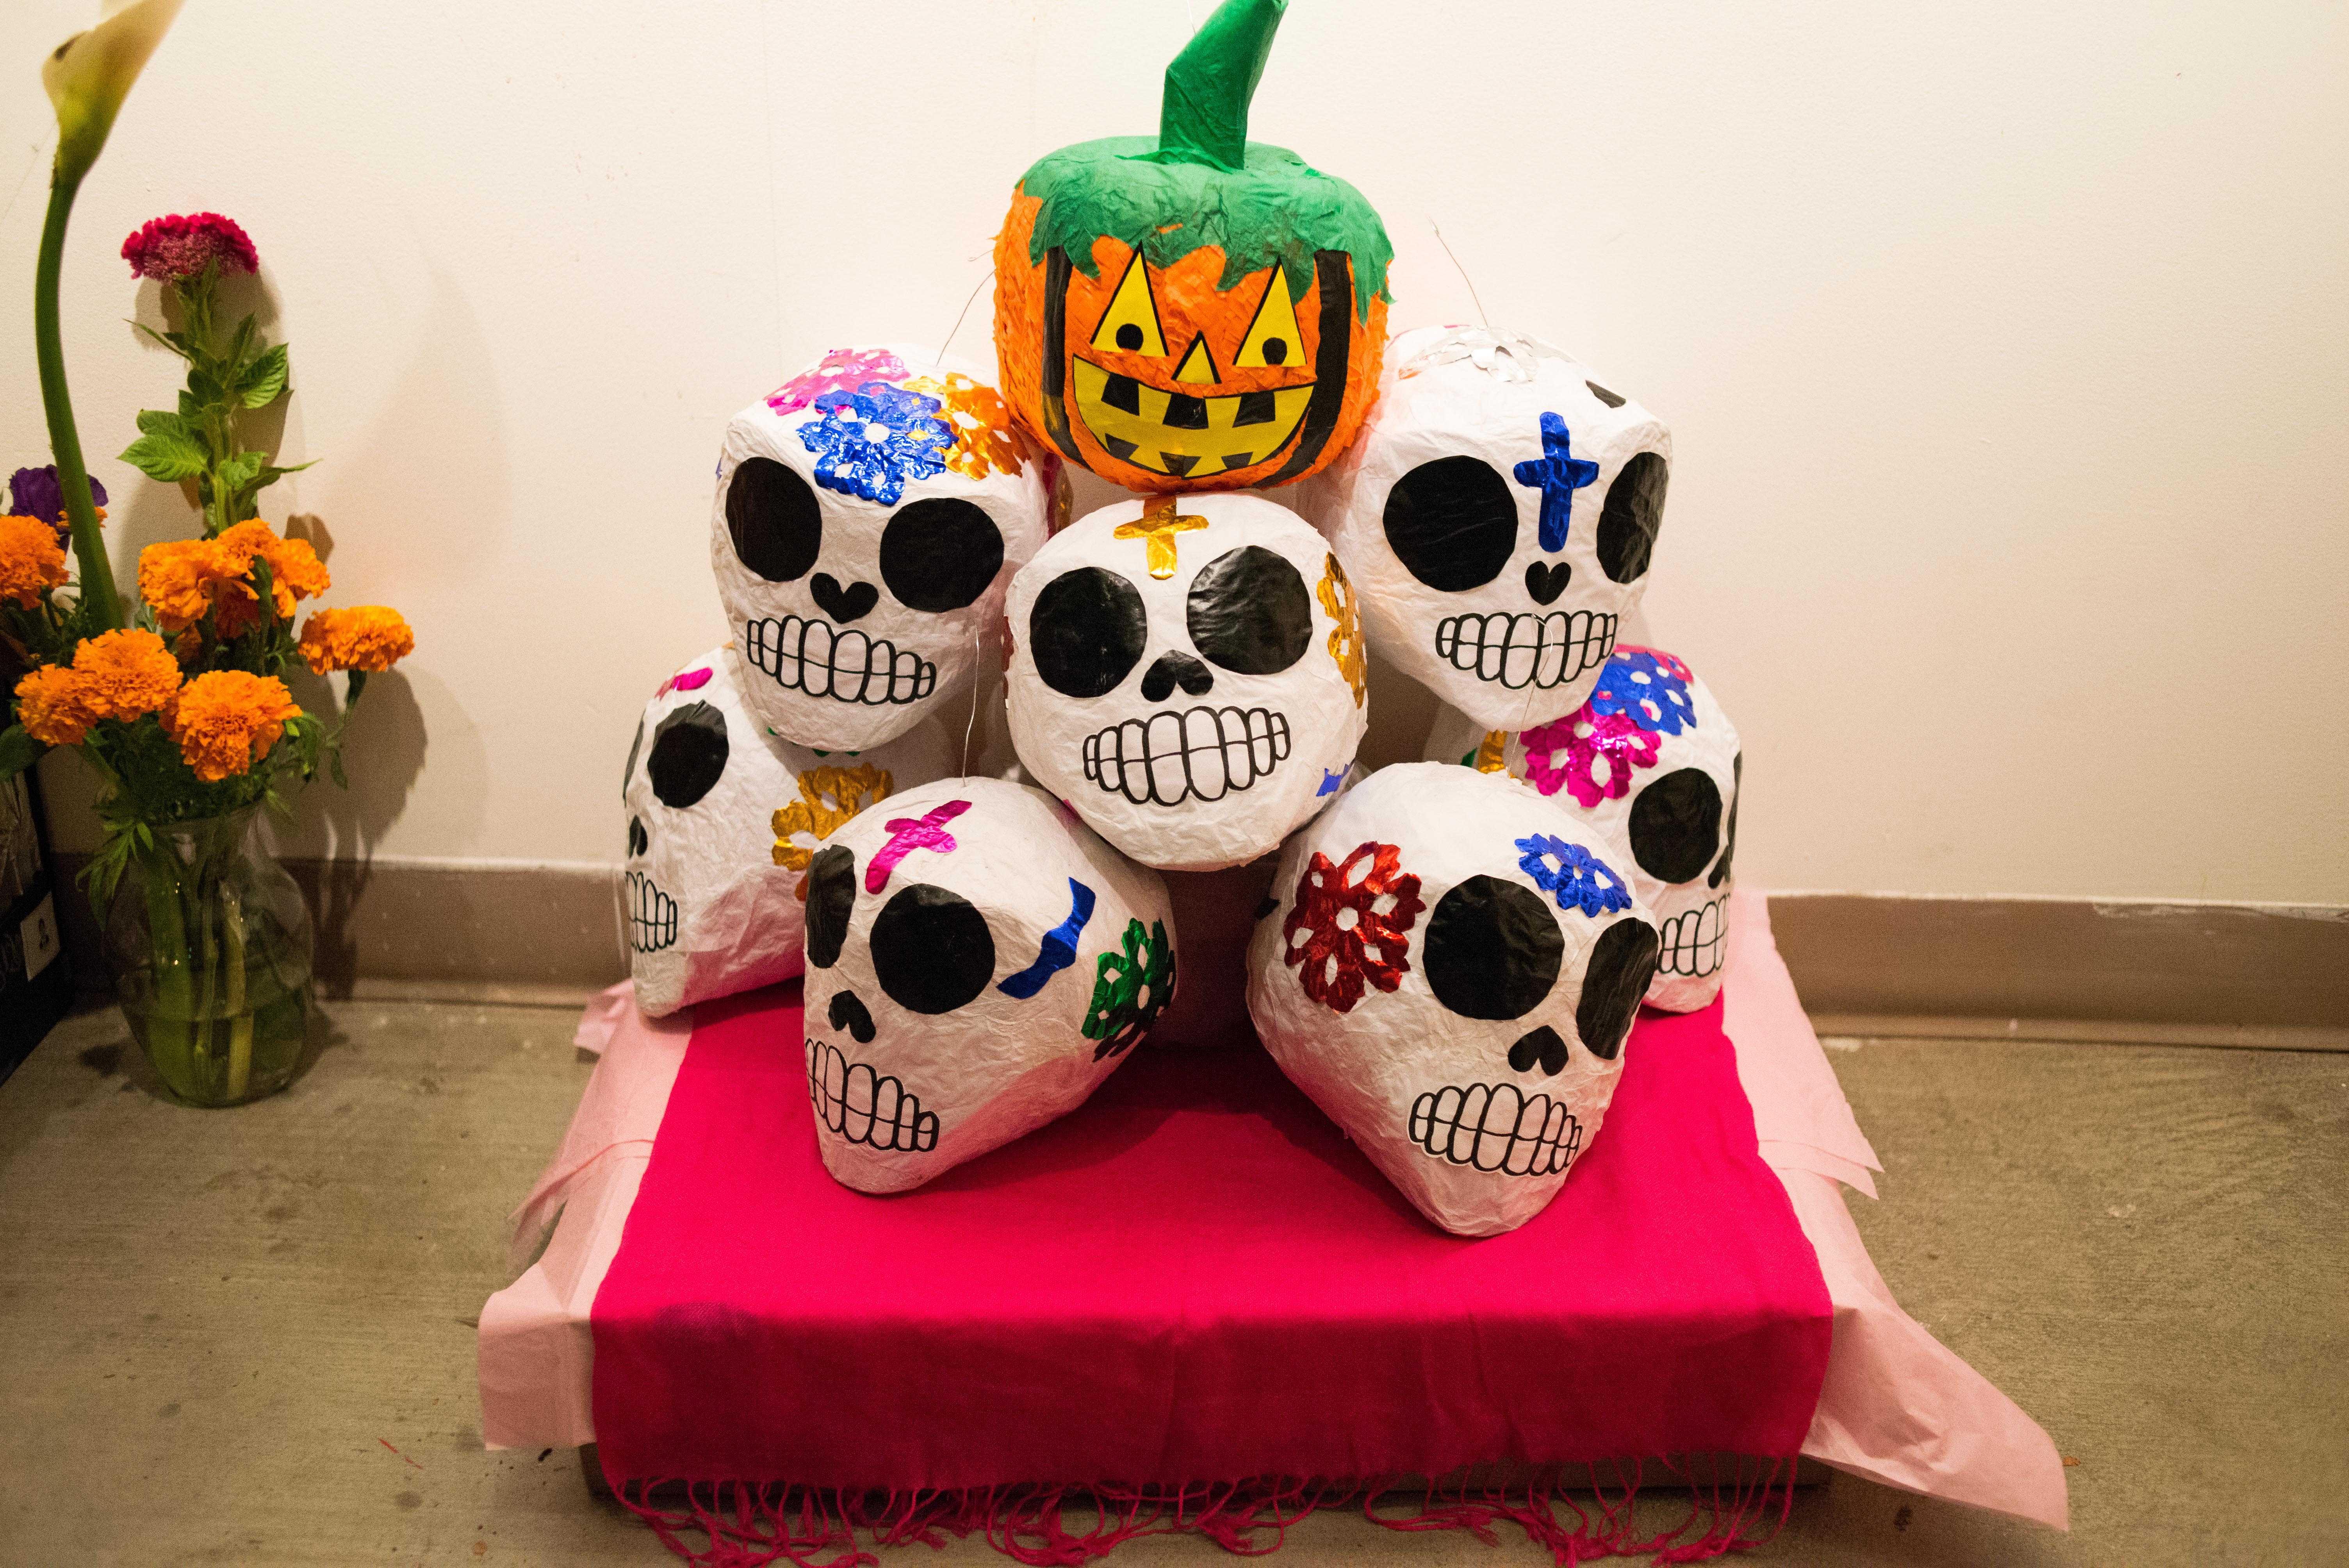 Alter shows paper skulls and jackolantern on alter